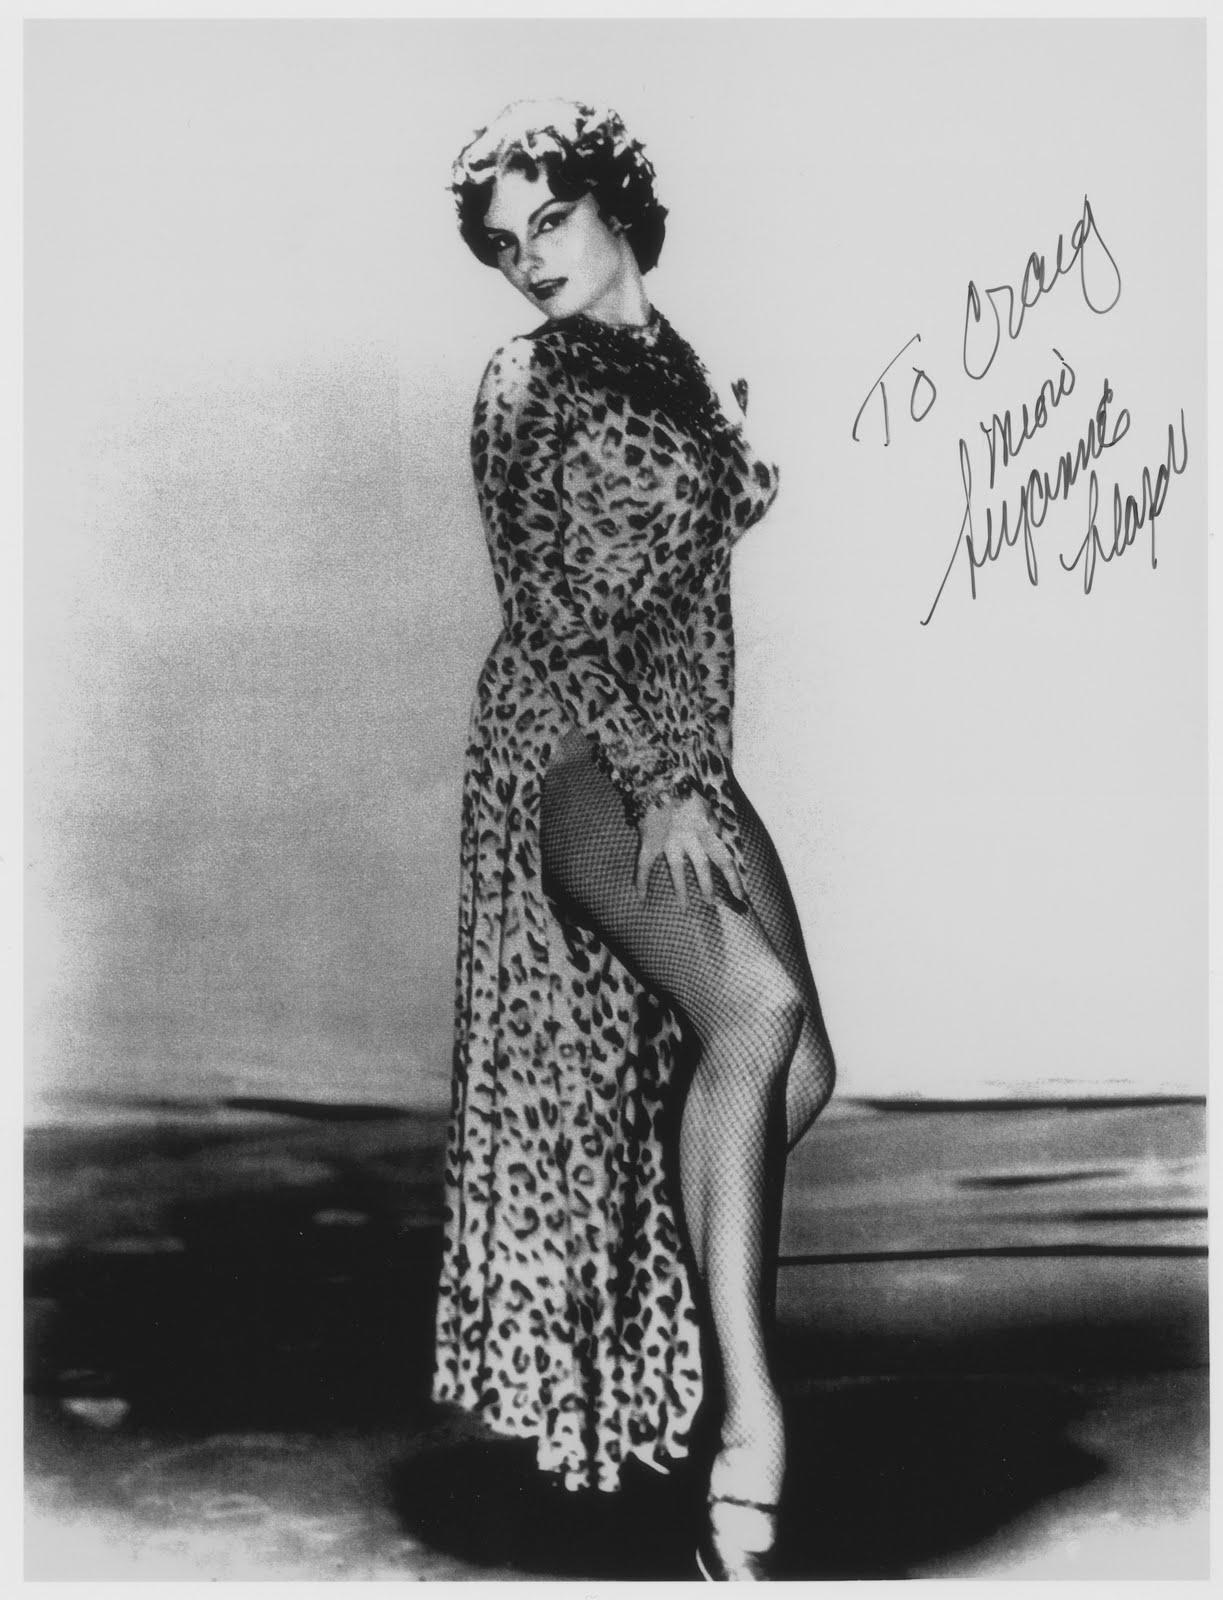 Nela Alvarez (b. 1918),Rachael Harris Erotic gallery Ashley Cabrera (b. 2010),Pauline Quirke (born 1959)